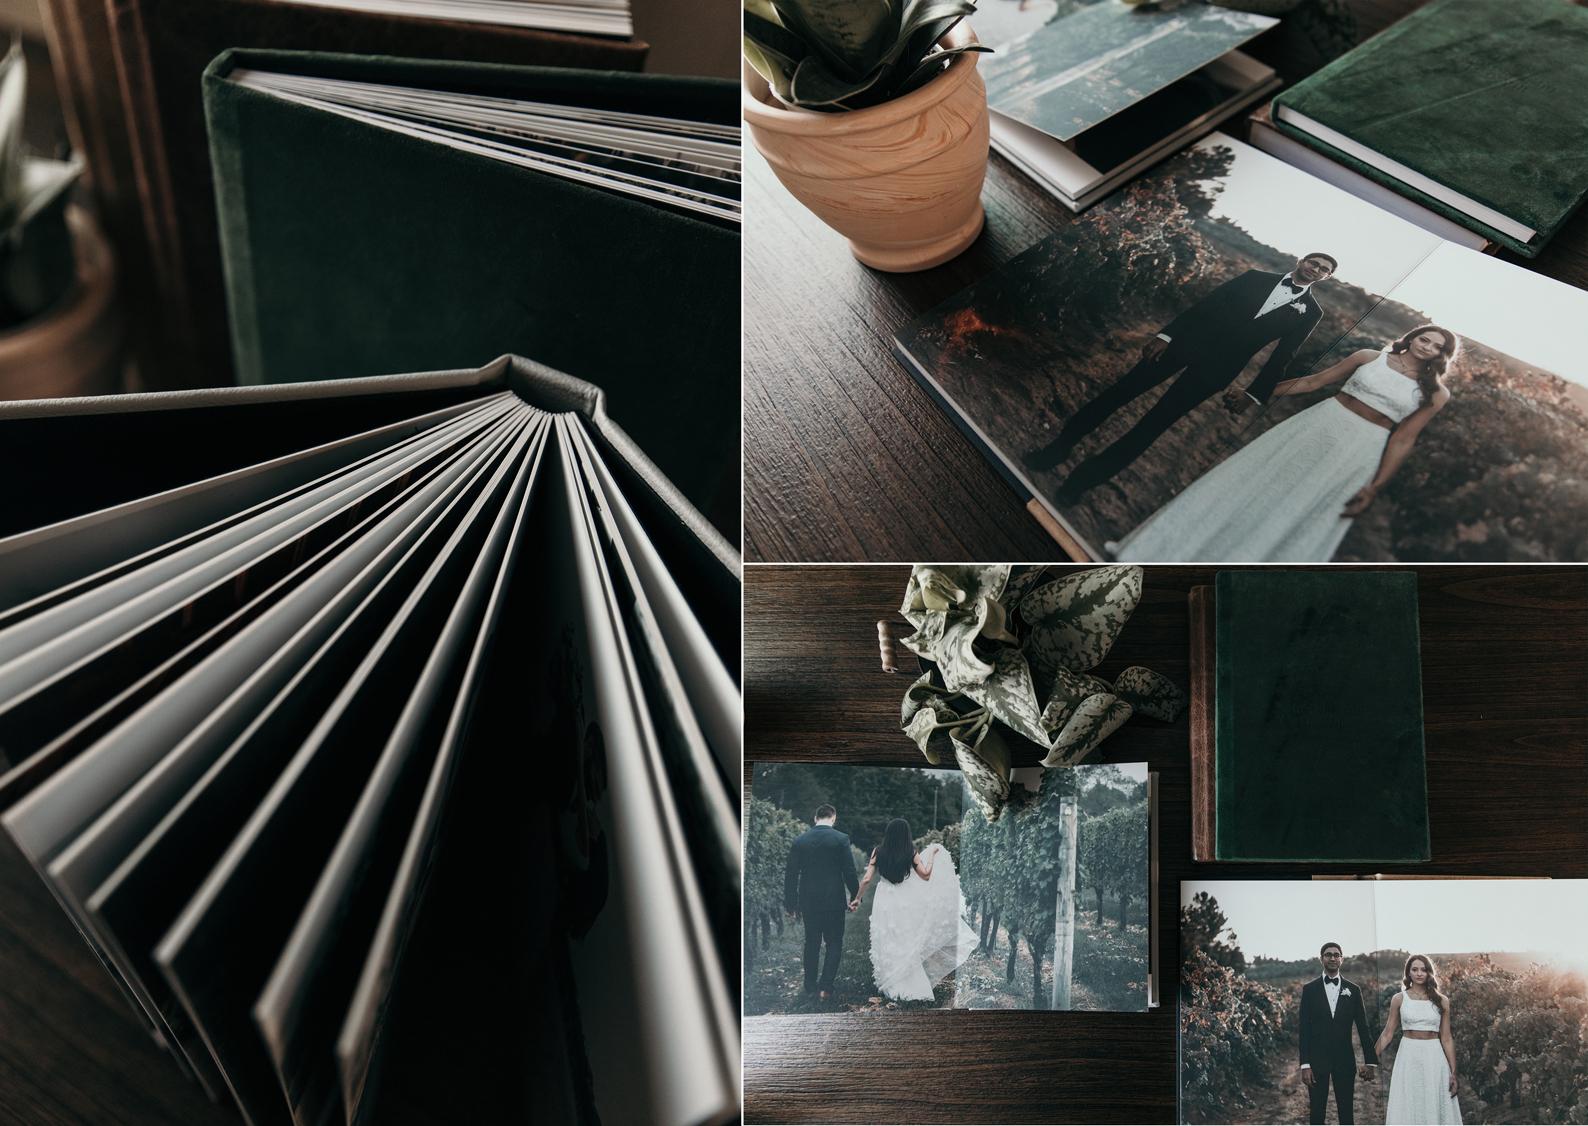 SanDiegoWeddingPhotographers.jpg